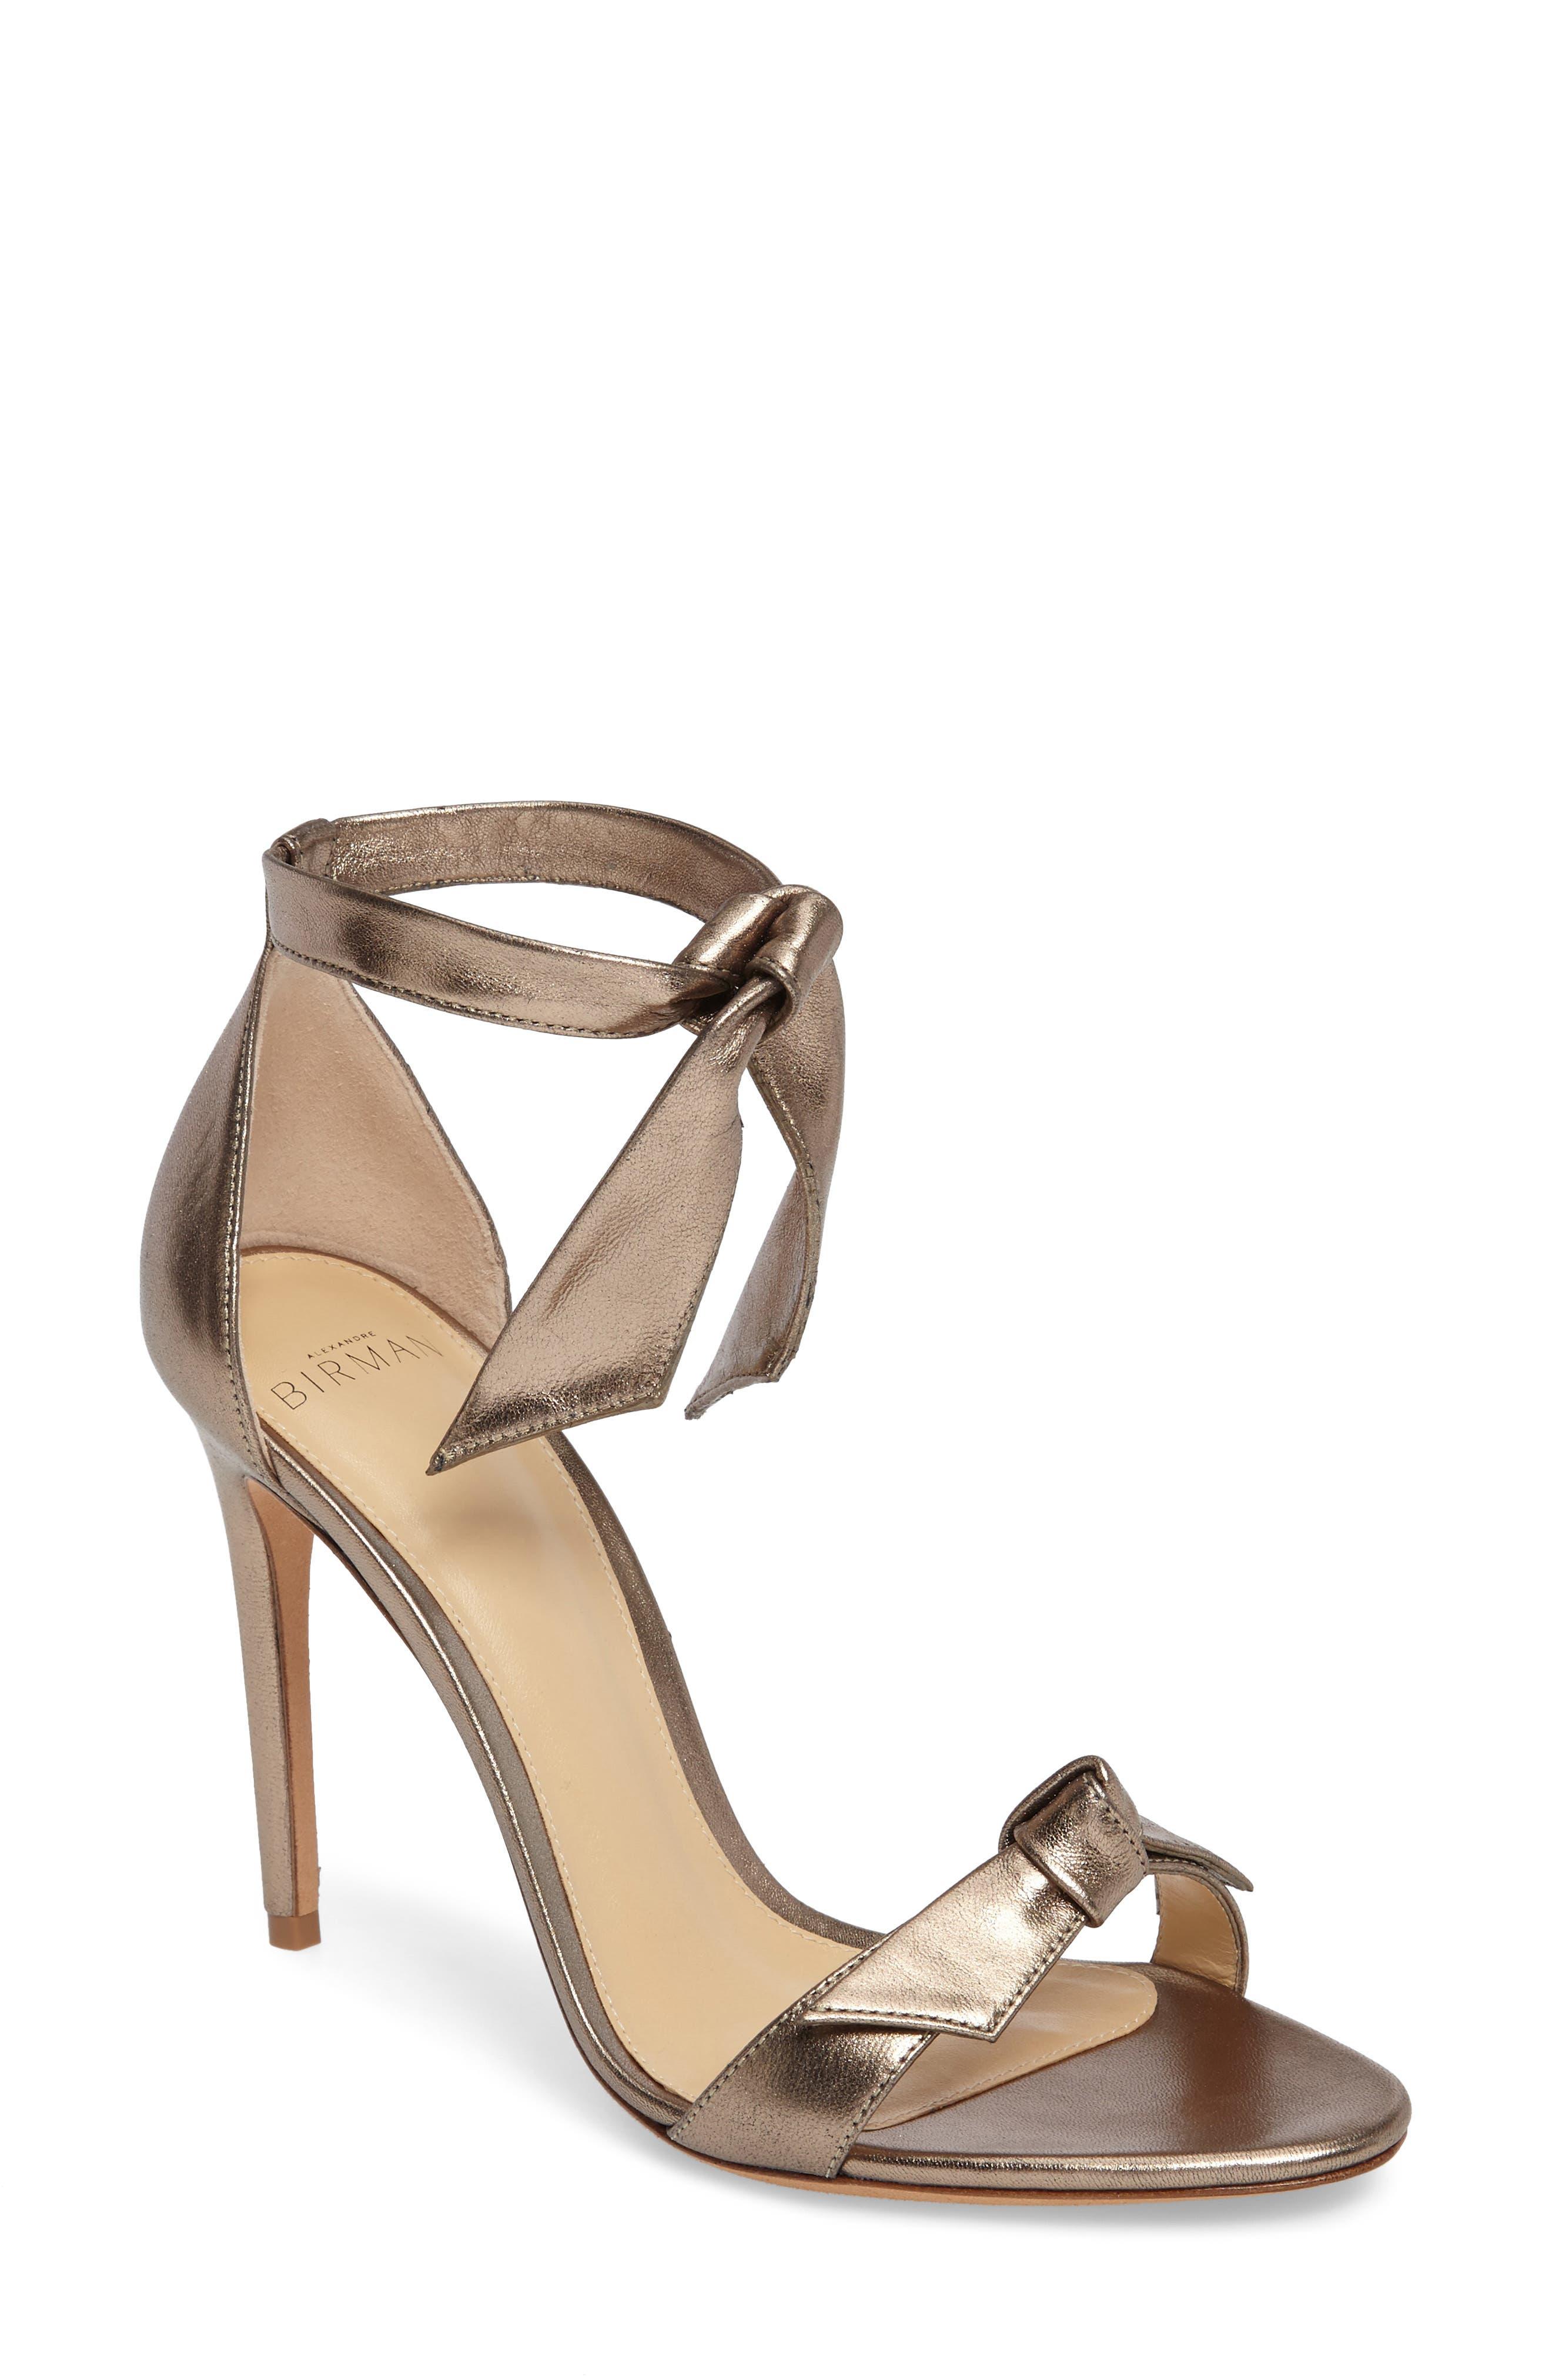 Clarita Ankle Tie Sandal,                             Main thumbnail 1, color,                             METALLIC GOLD LEATHER